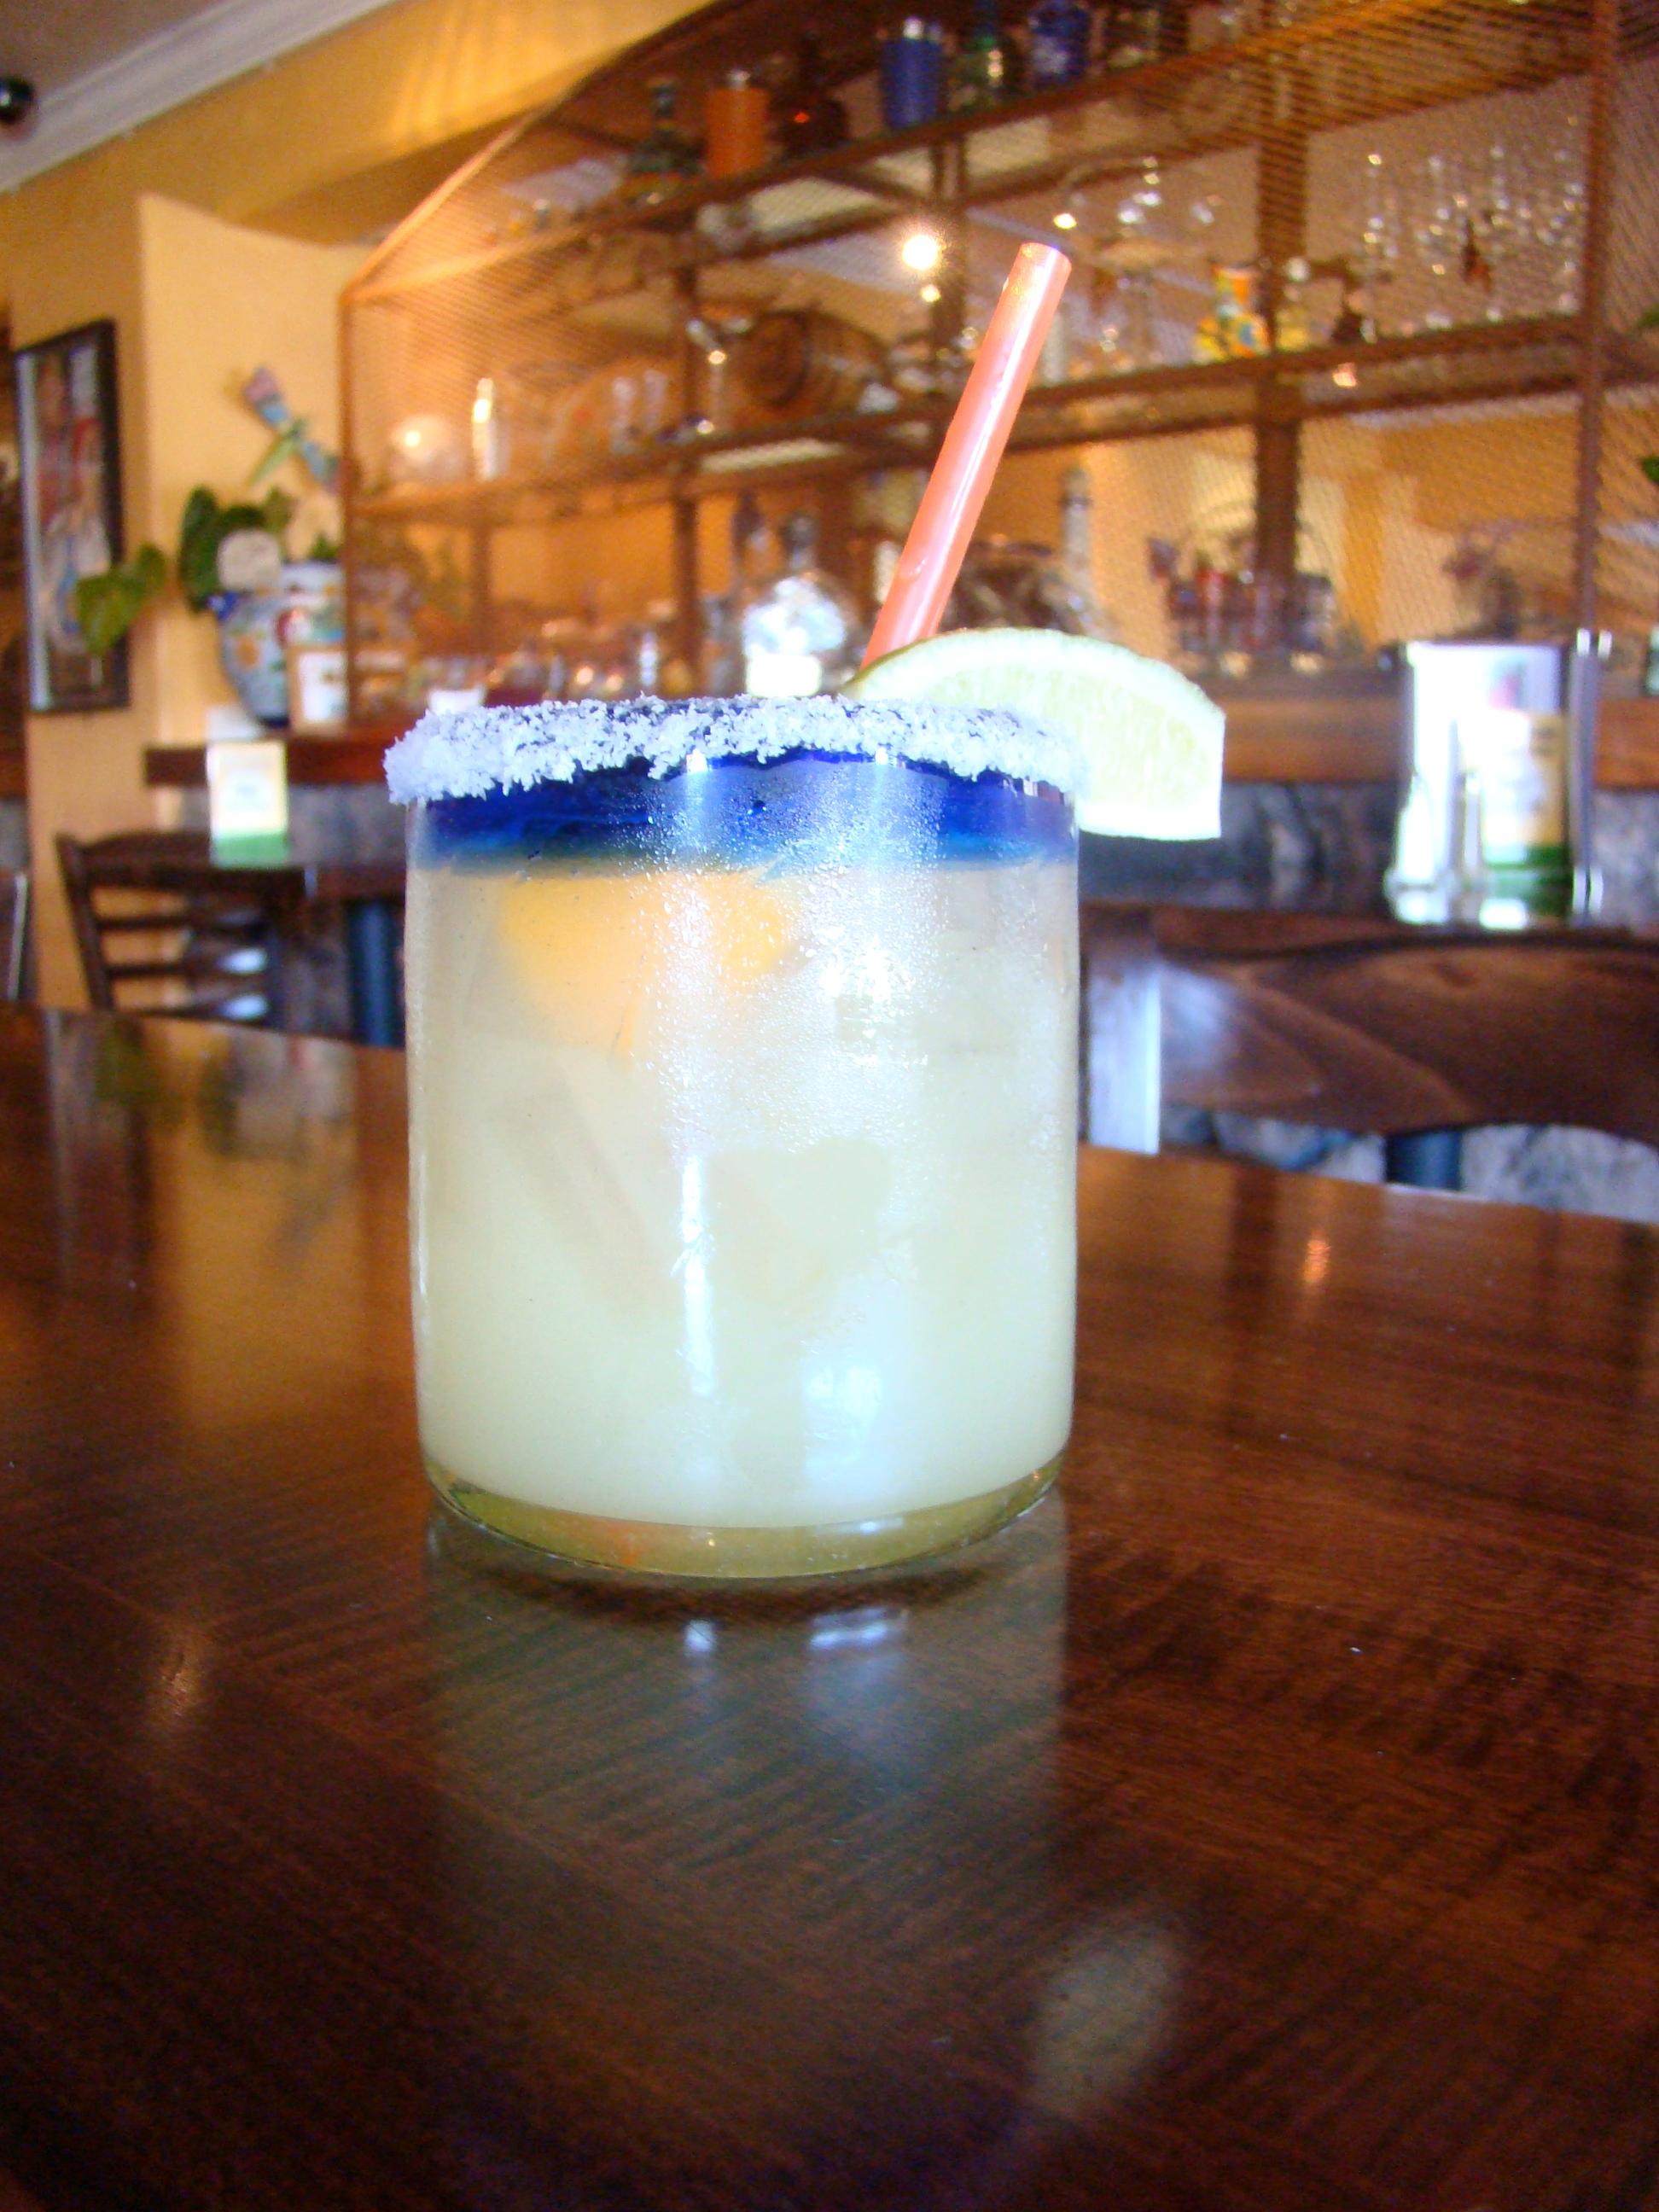 Saylor's Restaurant & Bar image 1